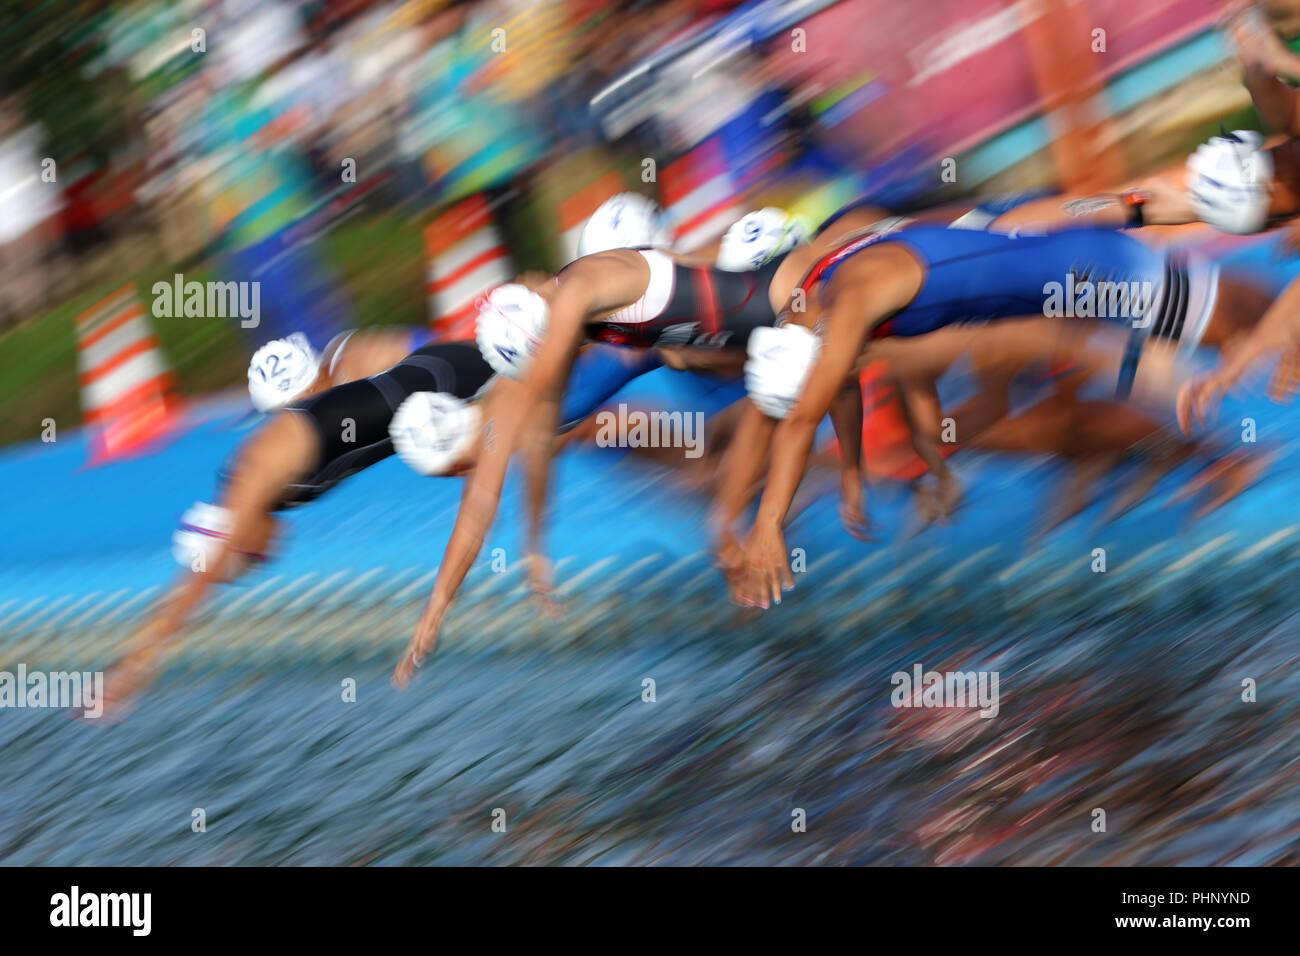 Palembang, Indonesia. 2nd Sep, 2018. General view Triathlon : Mixed Relay at Jakabaring Sport Center Lake during the 2018 Jakarta Palembang Asian Games in Palembang, Indonesia . Credit: Yohei Osada/AFLO SPORT/Alamy Live News - Stock Image